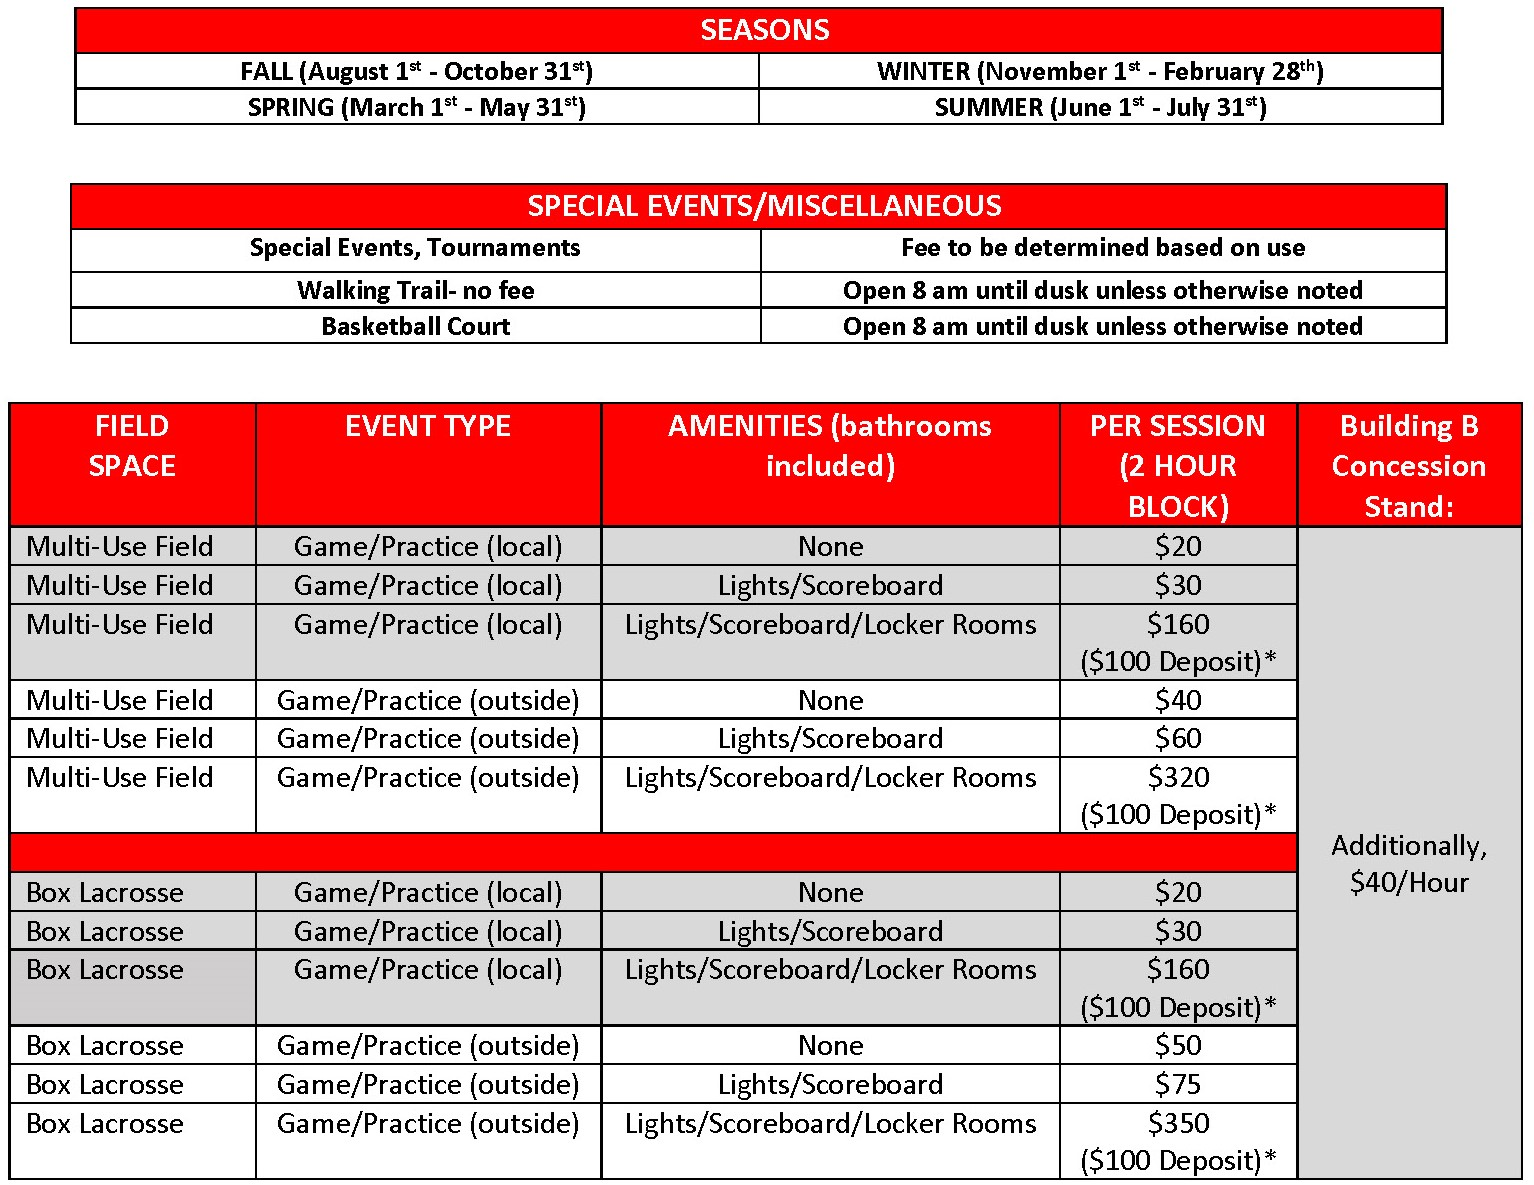 Vets Park Fee Schedule